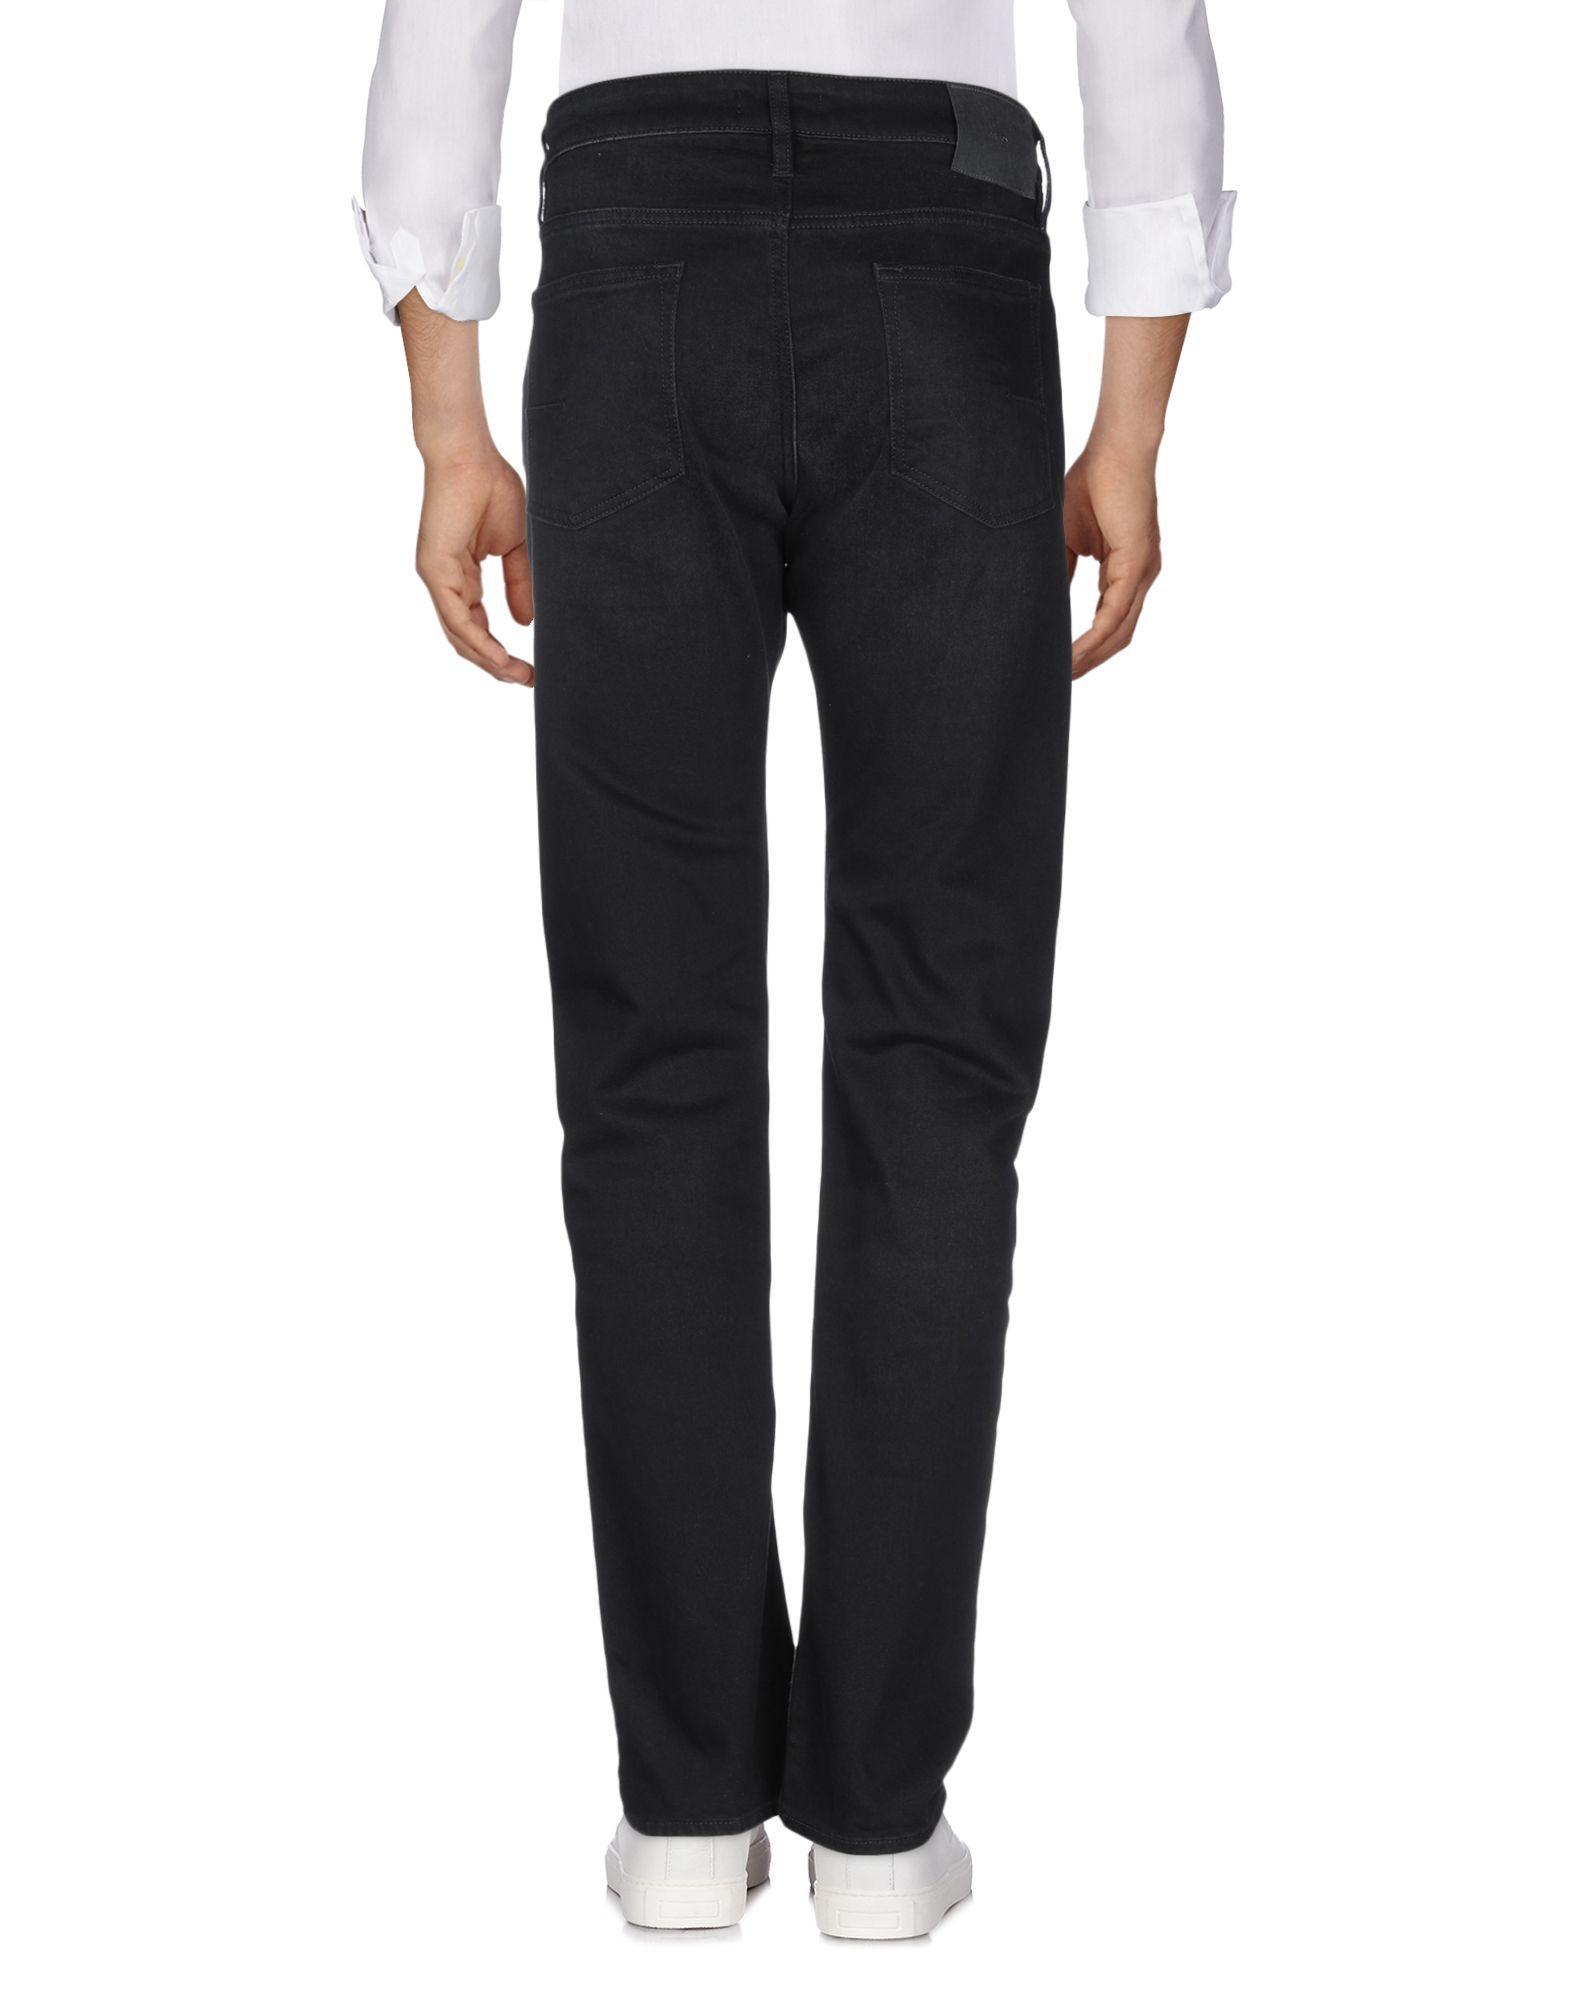 Mauro Grifoni Black Cotton Straight Leg Jeans